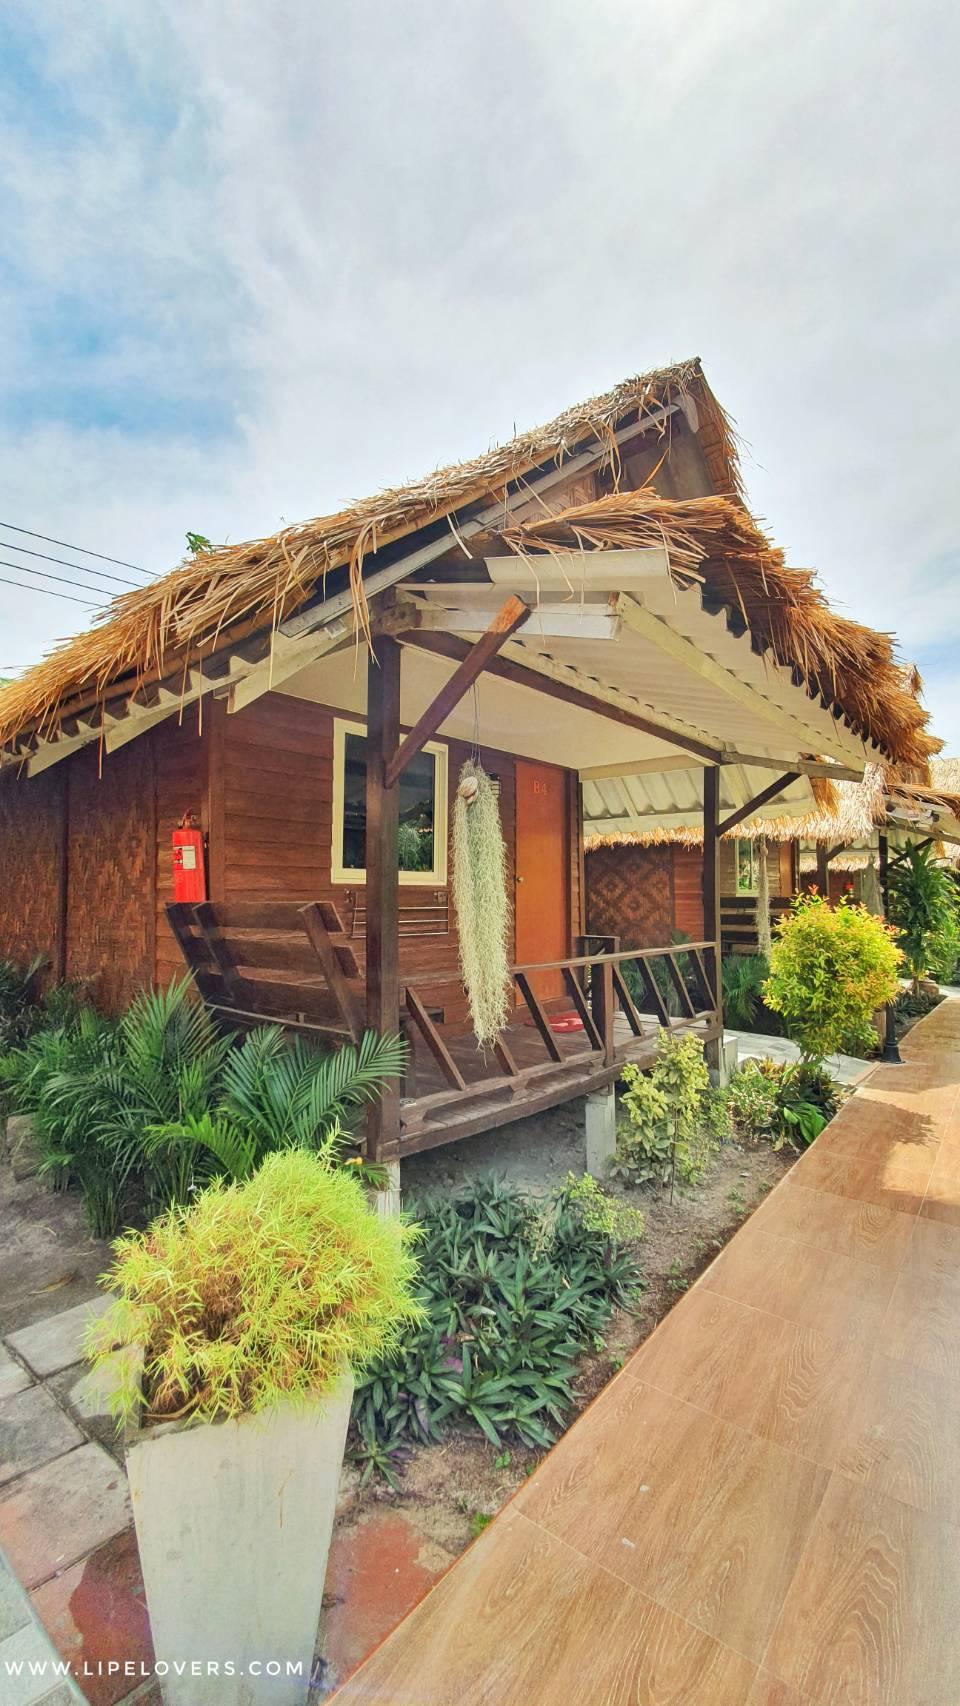 Charming Lipe Villa (ชามมิง รีสอร์ท เกาะหลีเป๊ะ)